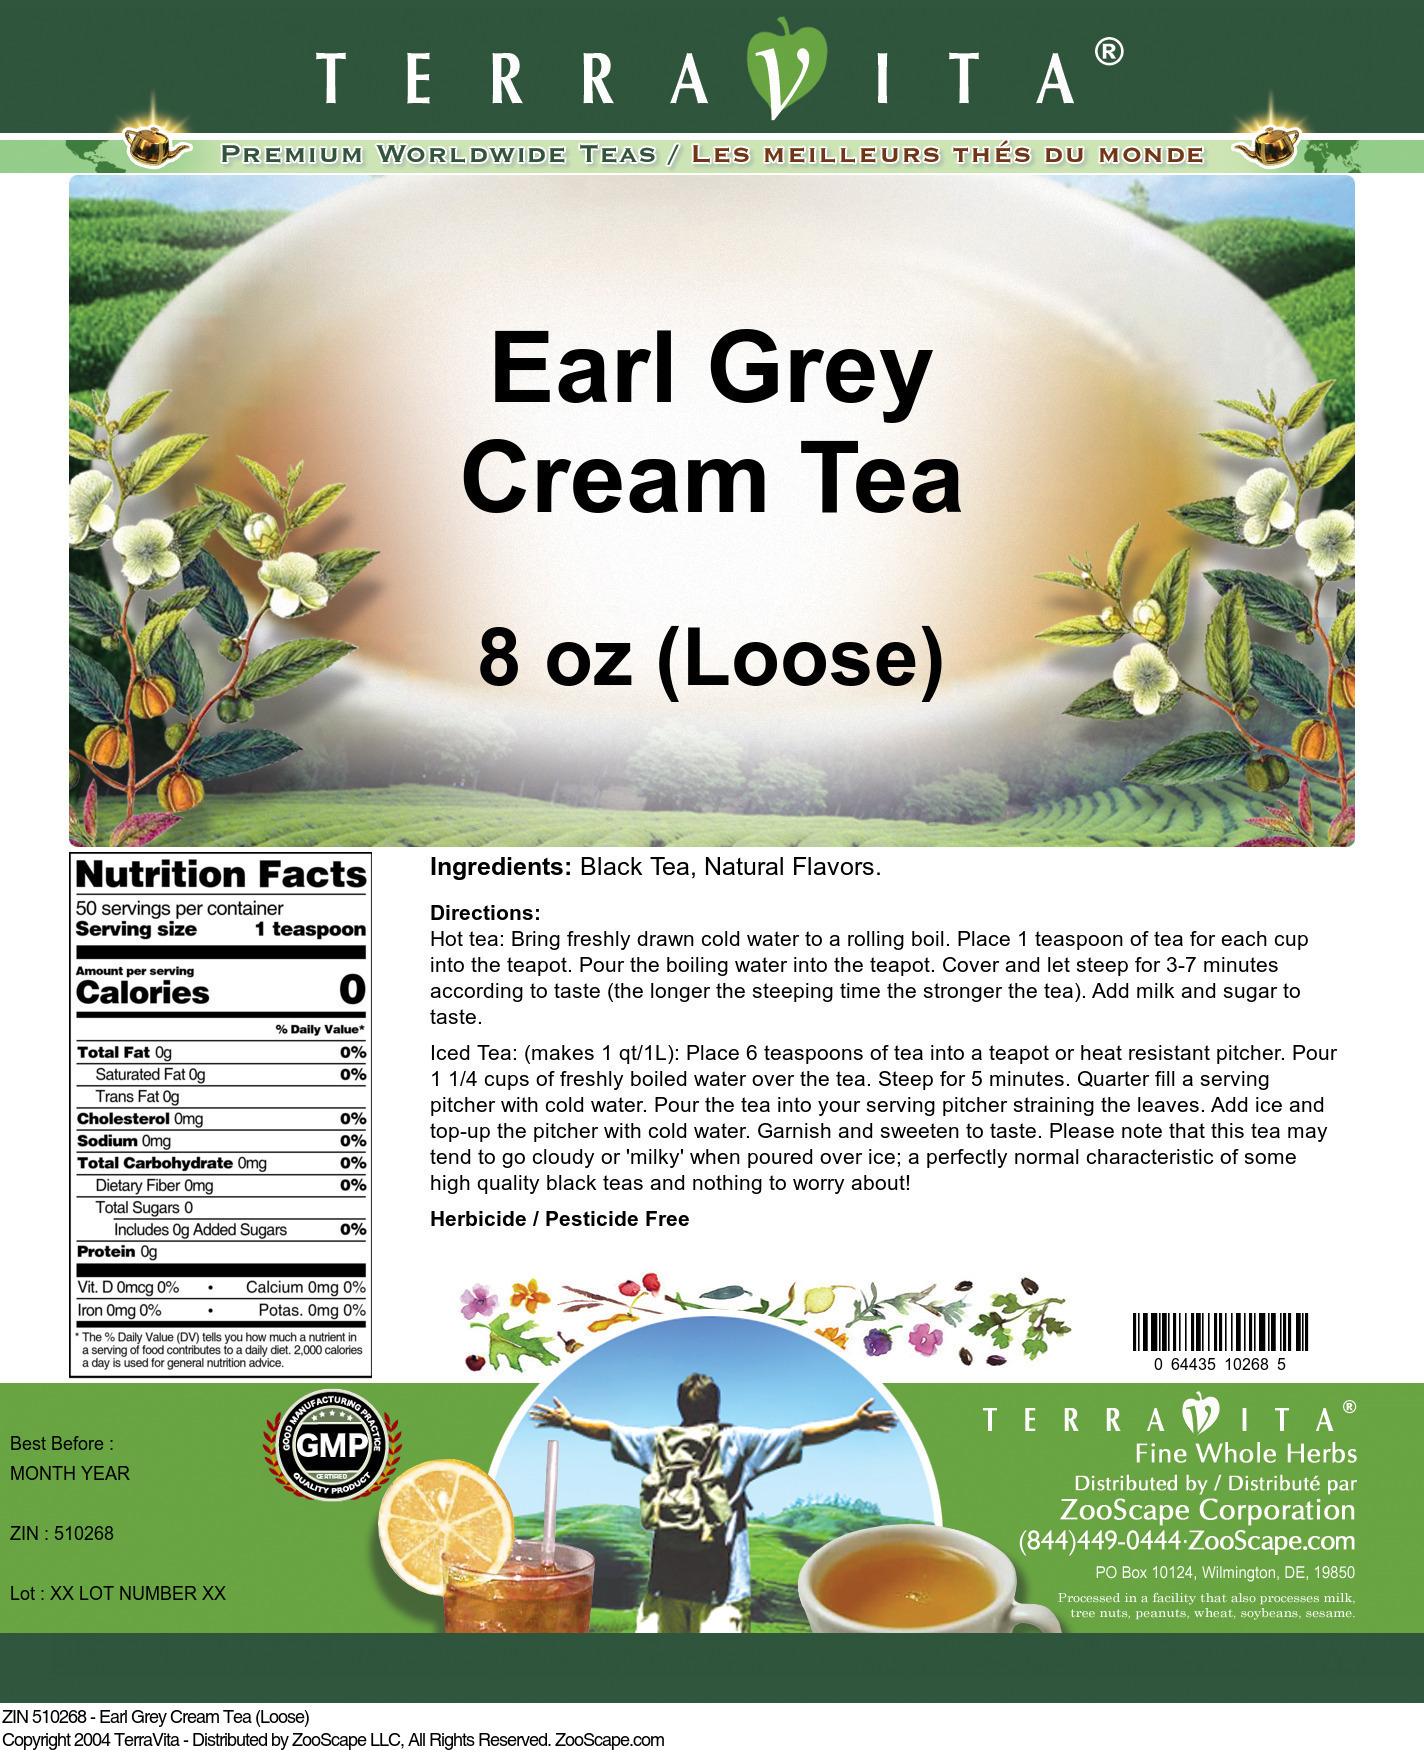 Earl Grey Cream Tea (Loose)